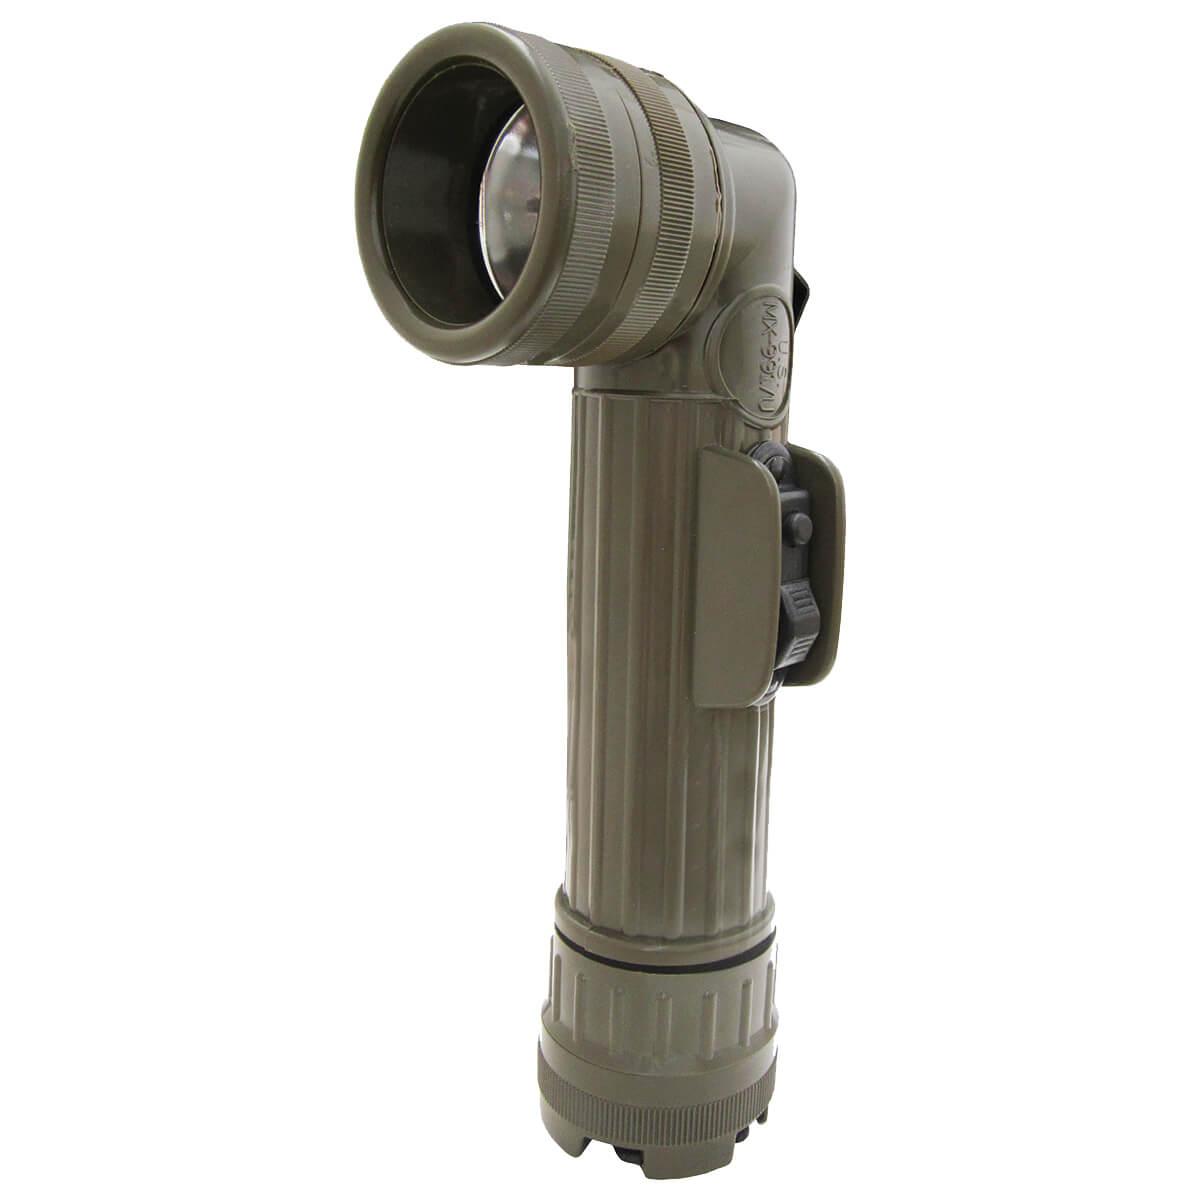 U.S. G.I. Waterproof Emergency Flashlight